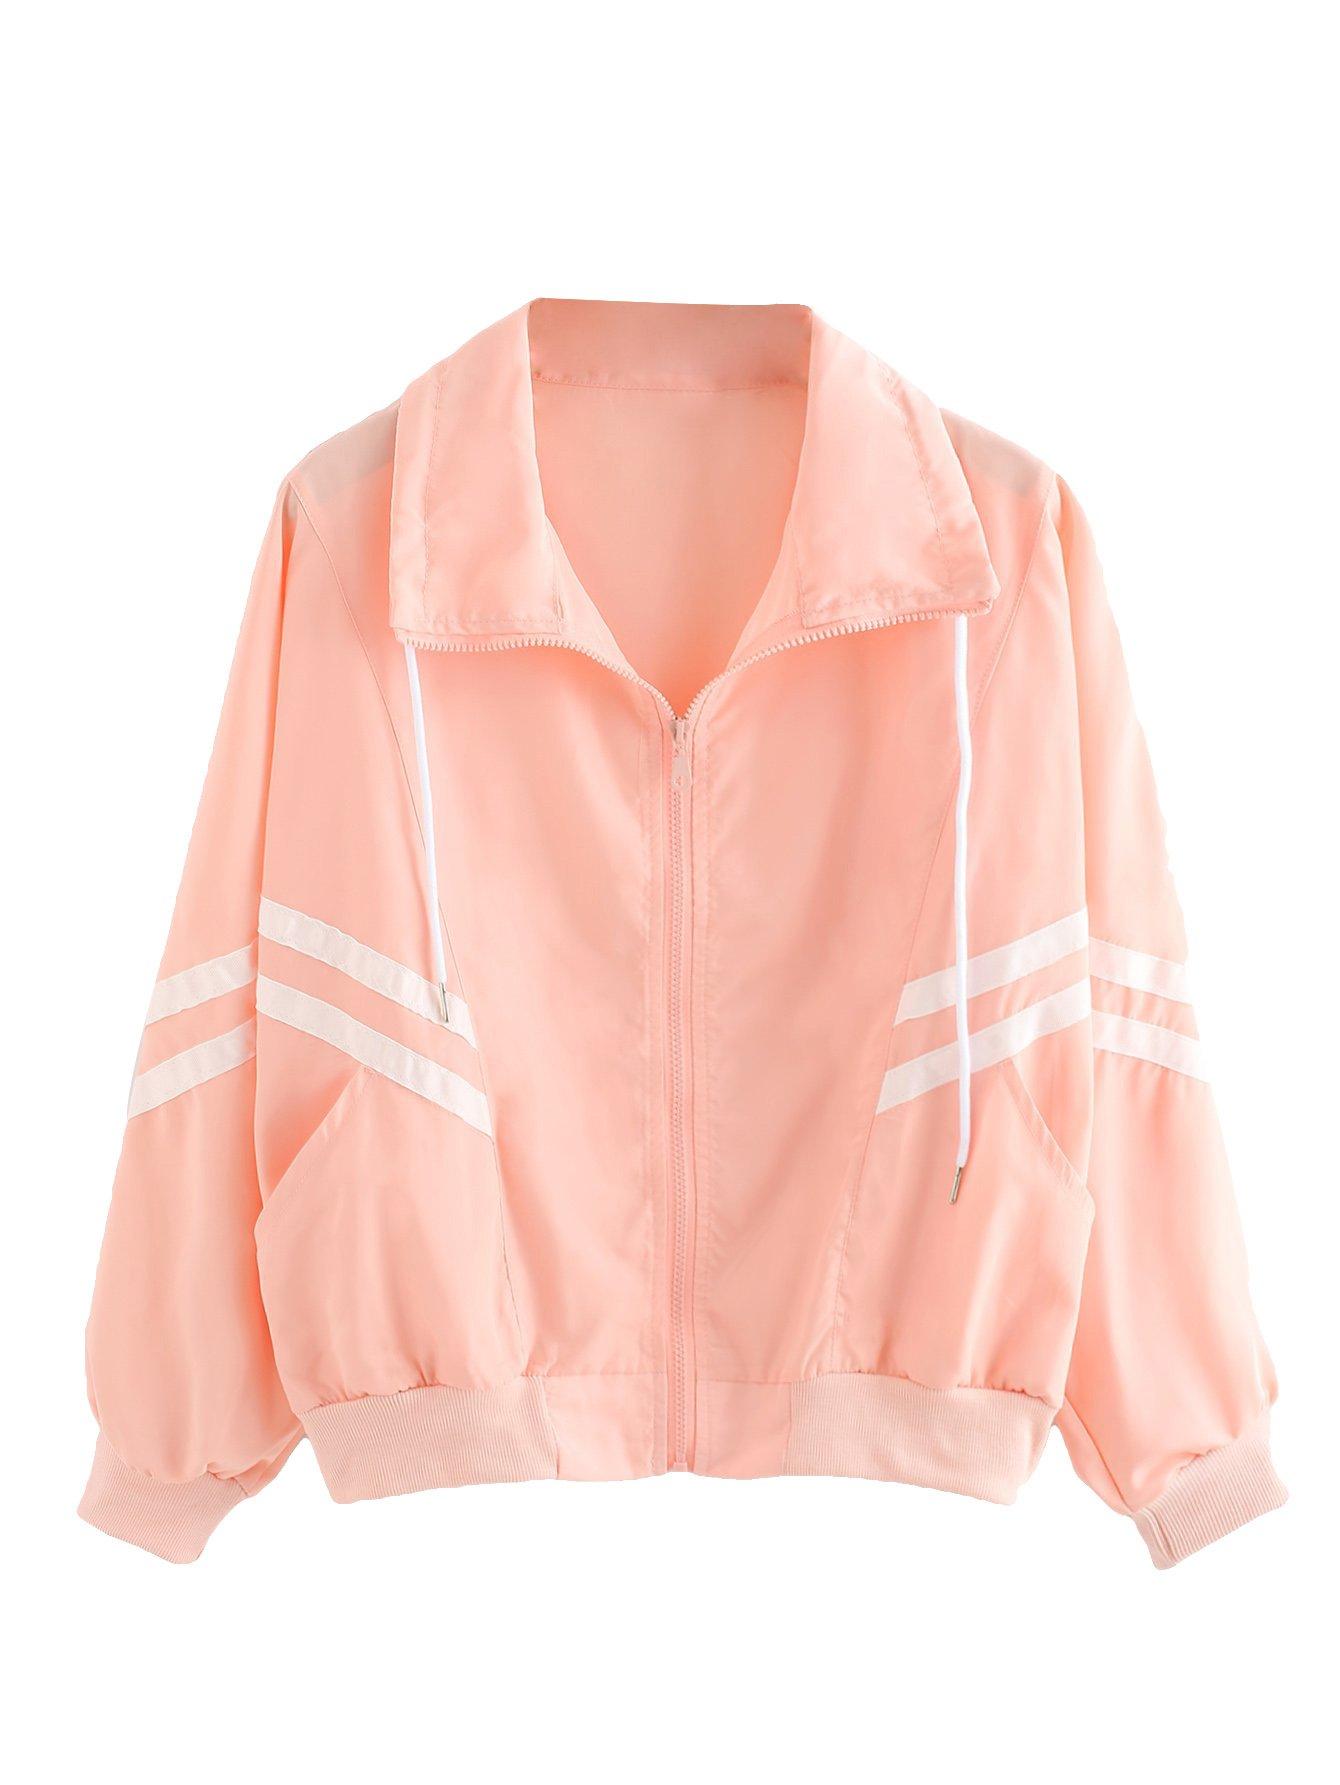 Verdusa Women's Drawstring Striped Tape Zip up Windproof Windbreaker Jacket Pink XL